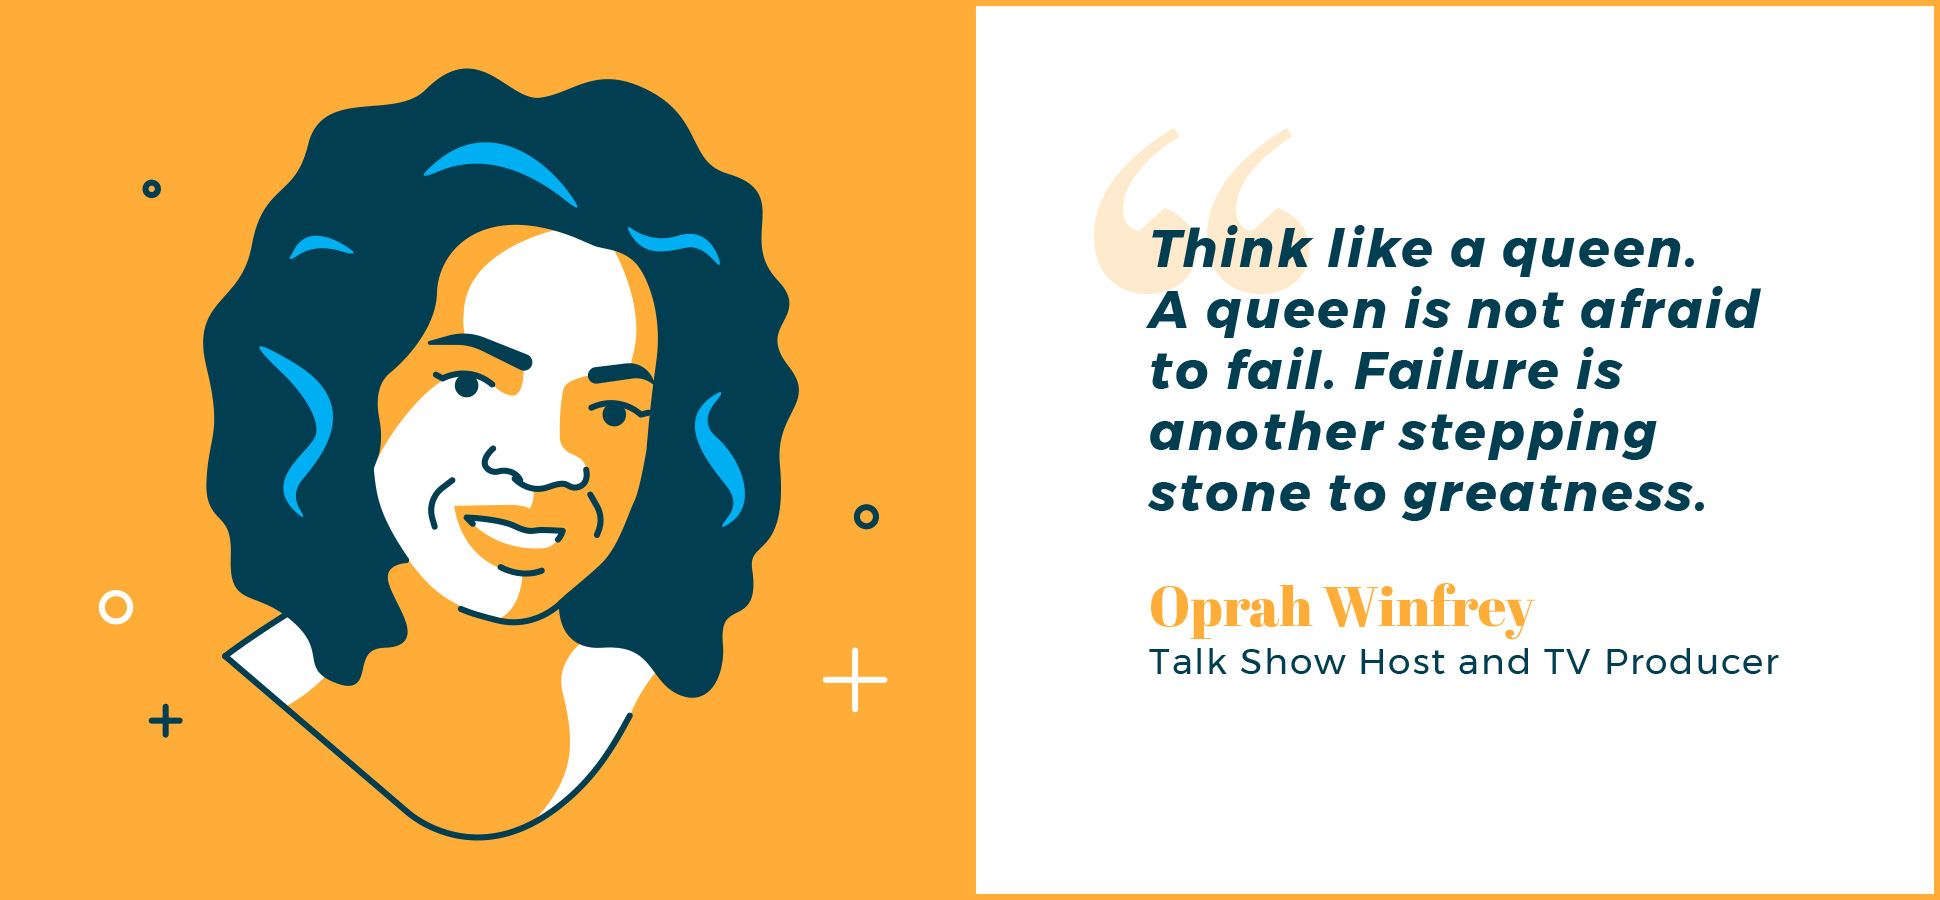 3 oprah winfrey